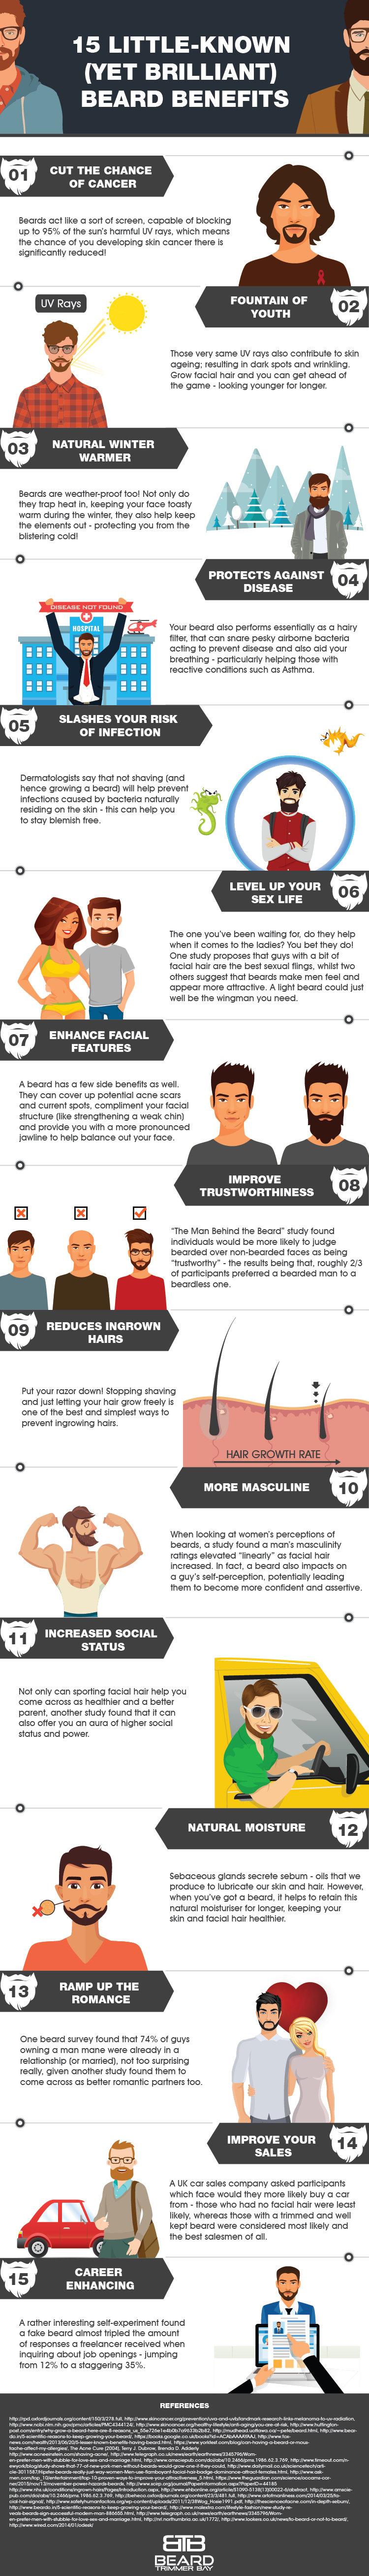 Benefits Of Having A Beard - Infographic